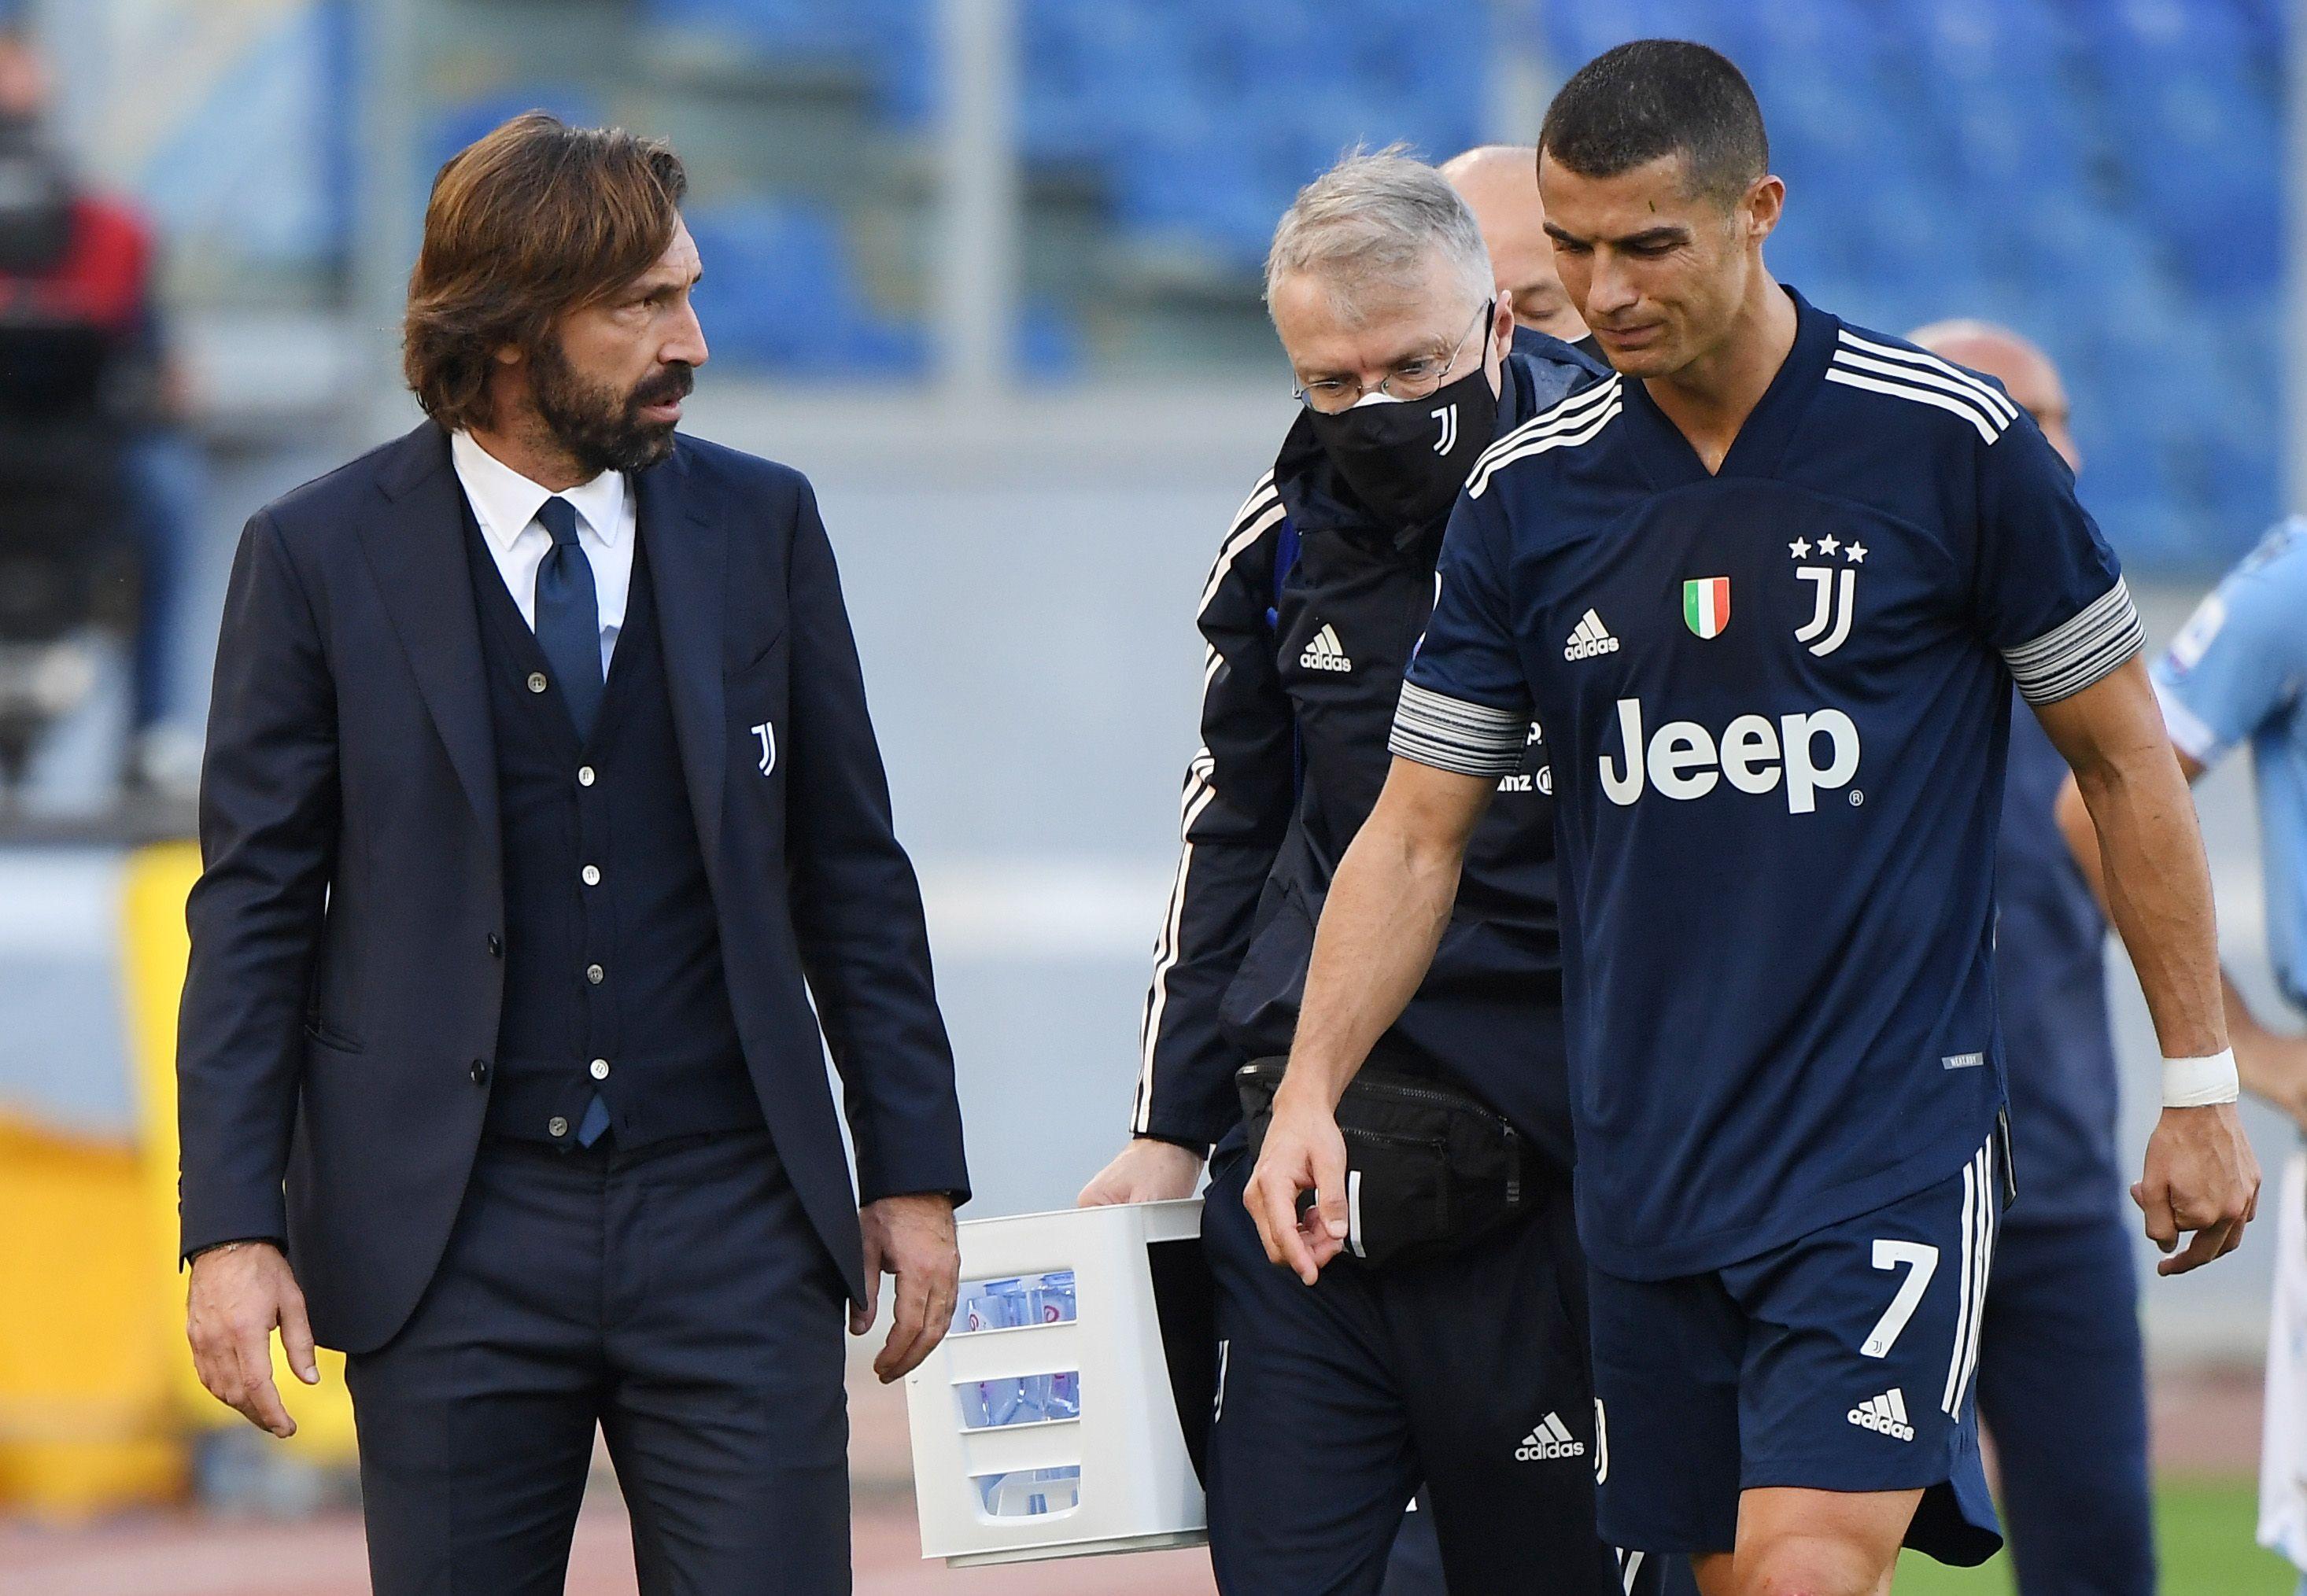 Juventus estudia la posibilidad de vender a Cristiano Ronaldo (REUTERS/Alberto Lingria)